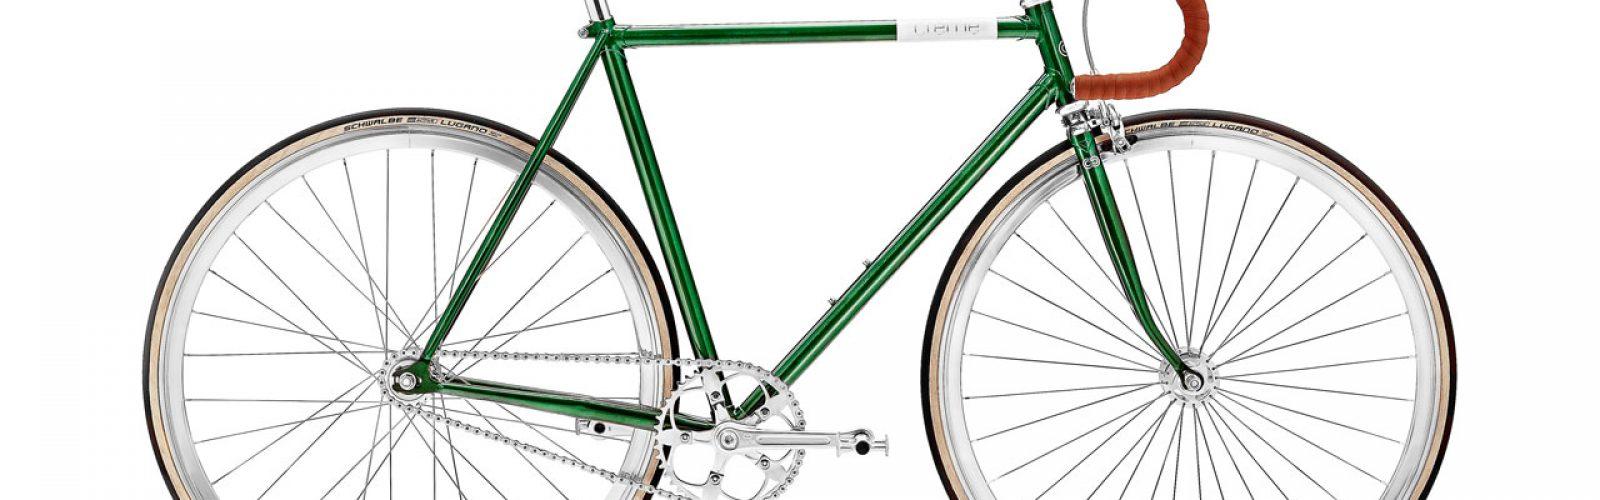 Verrassend Custom Bicycles - Stipbike ZJ-06